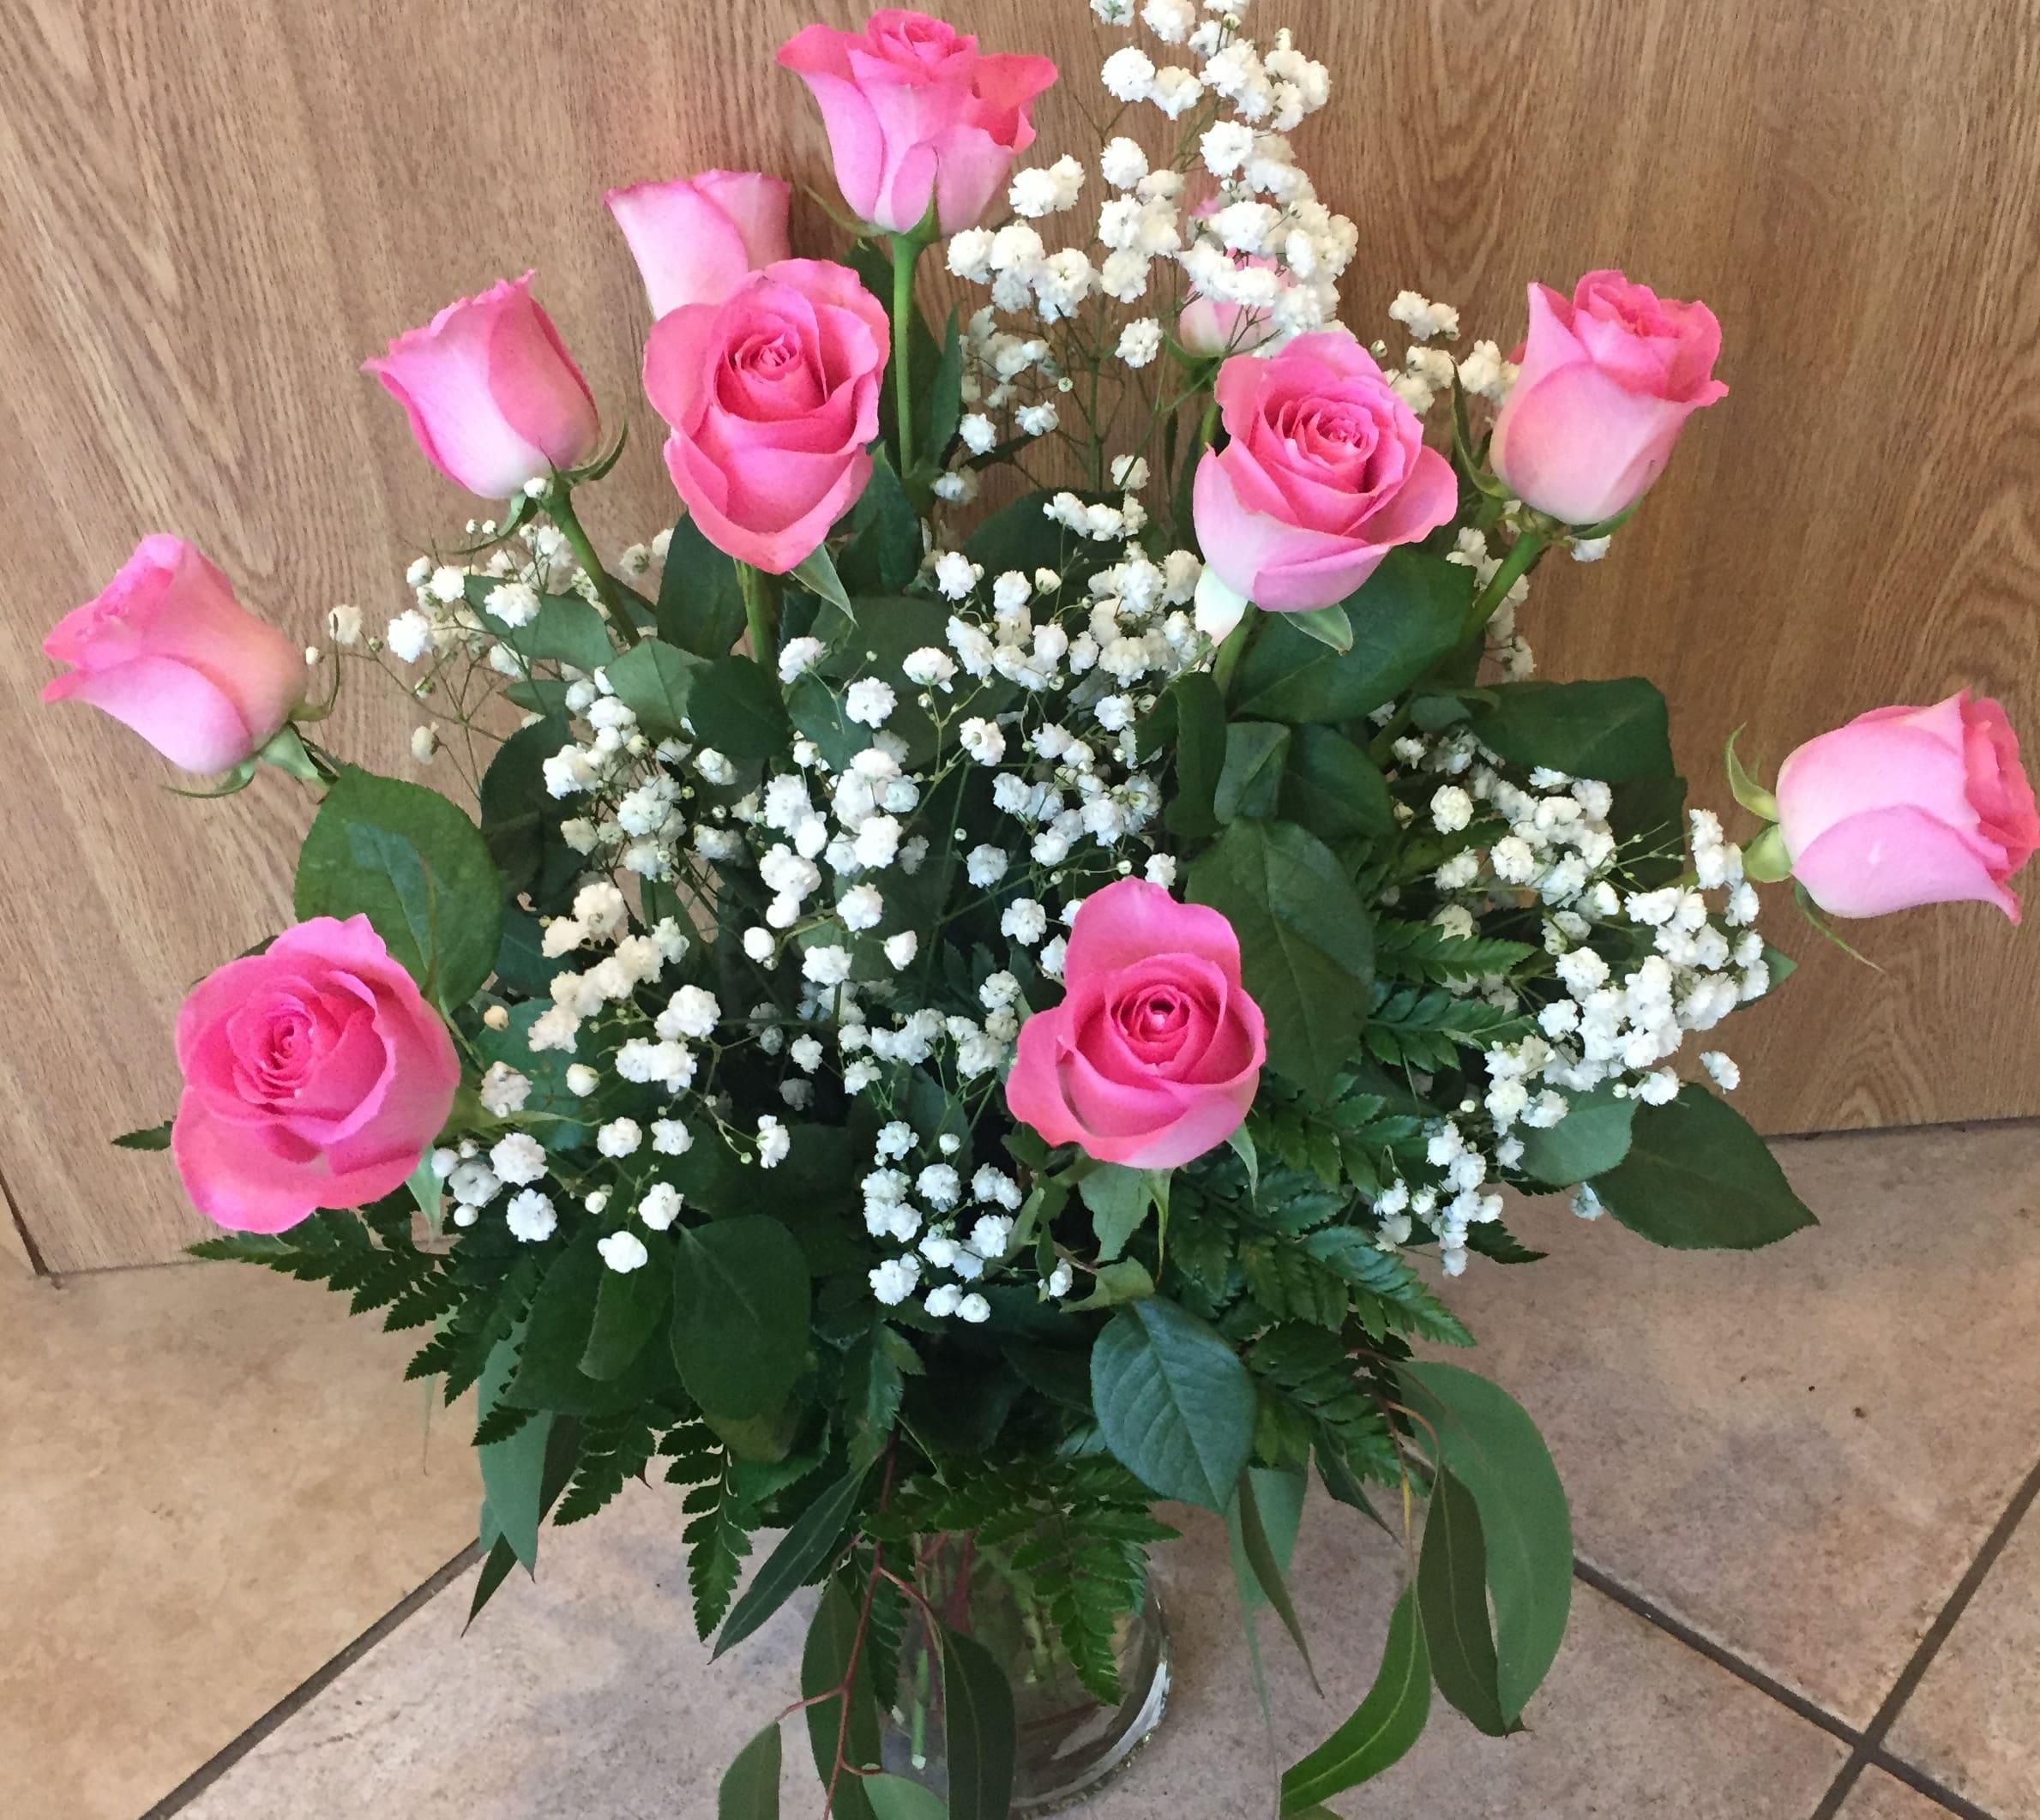 Dozen Pink Roses In A Vase In Mount Laurel Nj Flowers By Elizabeth